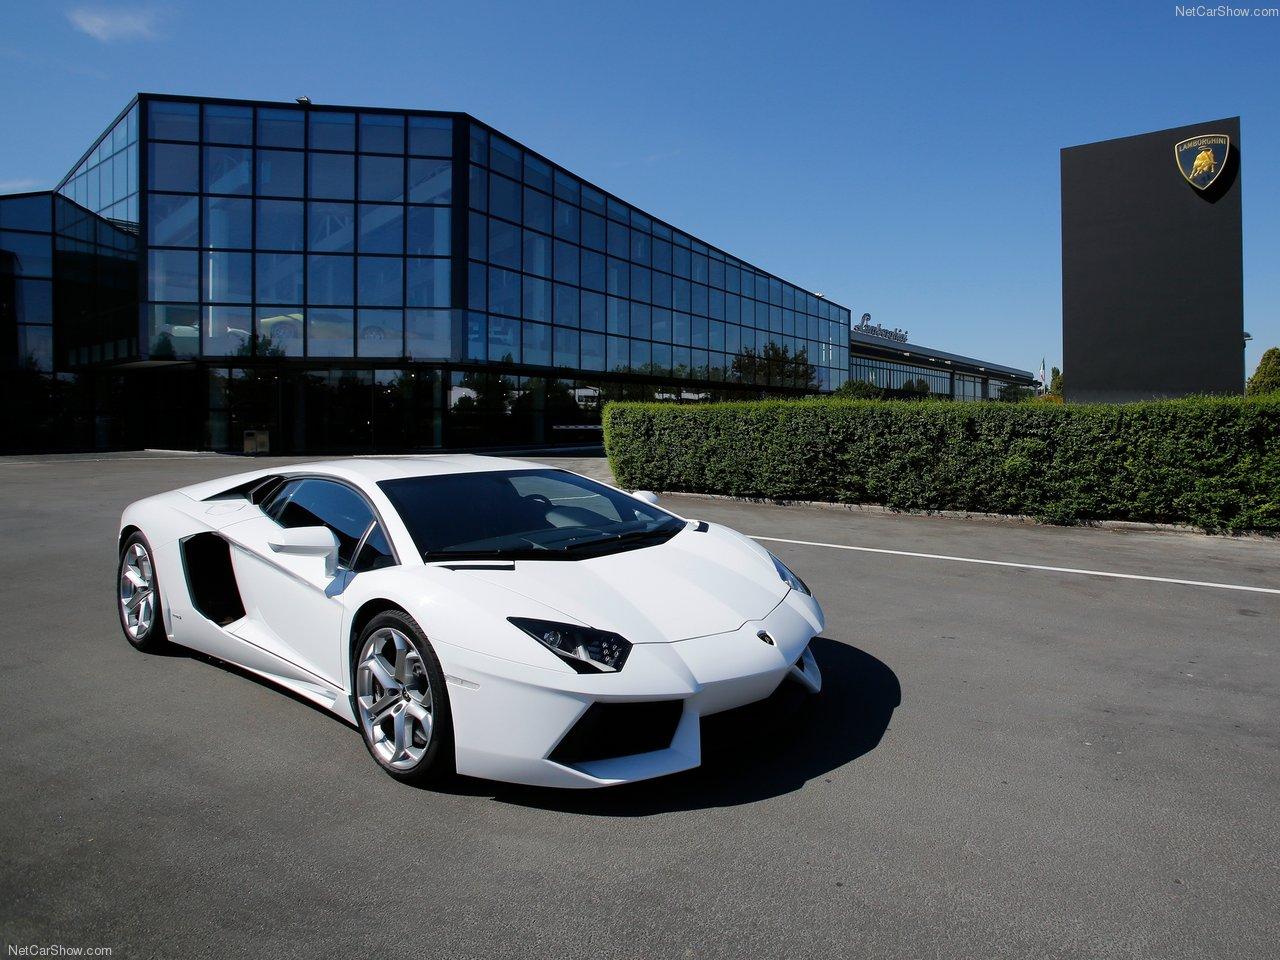 Lamborghini Aventador Lp700 4 2012 1280 01